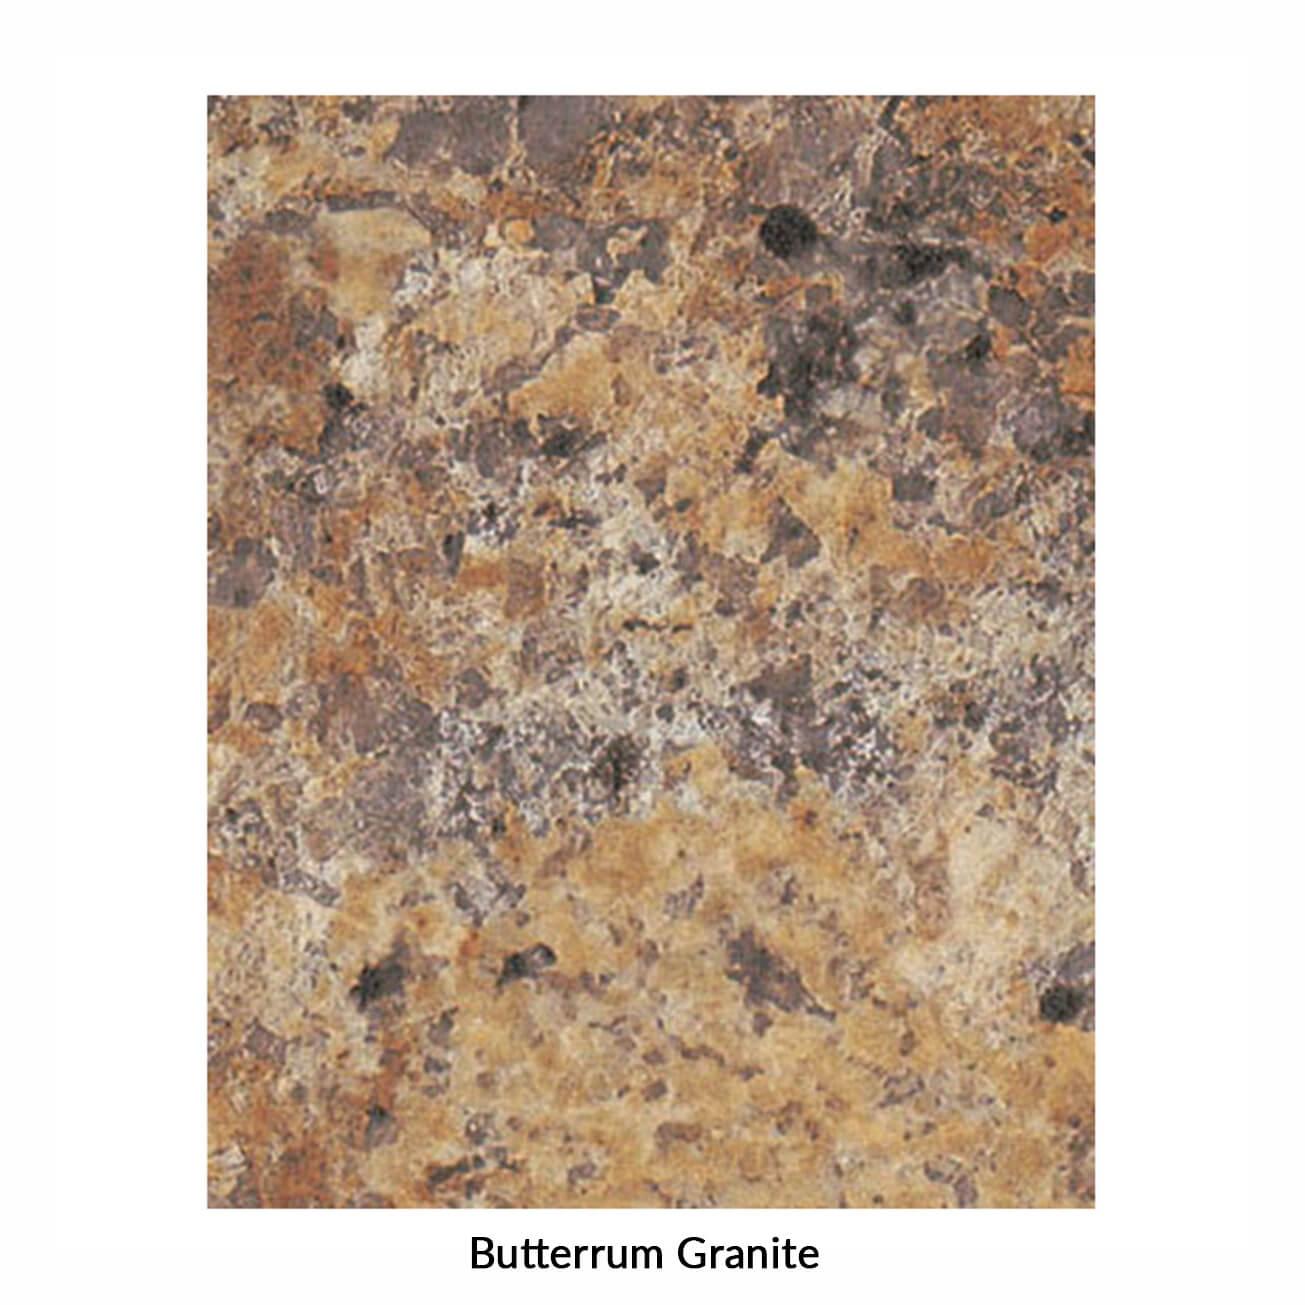 11-butterrum-granite.jpg